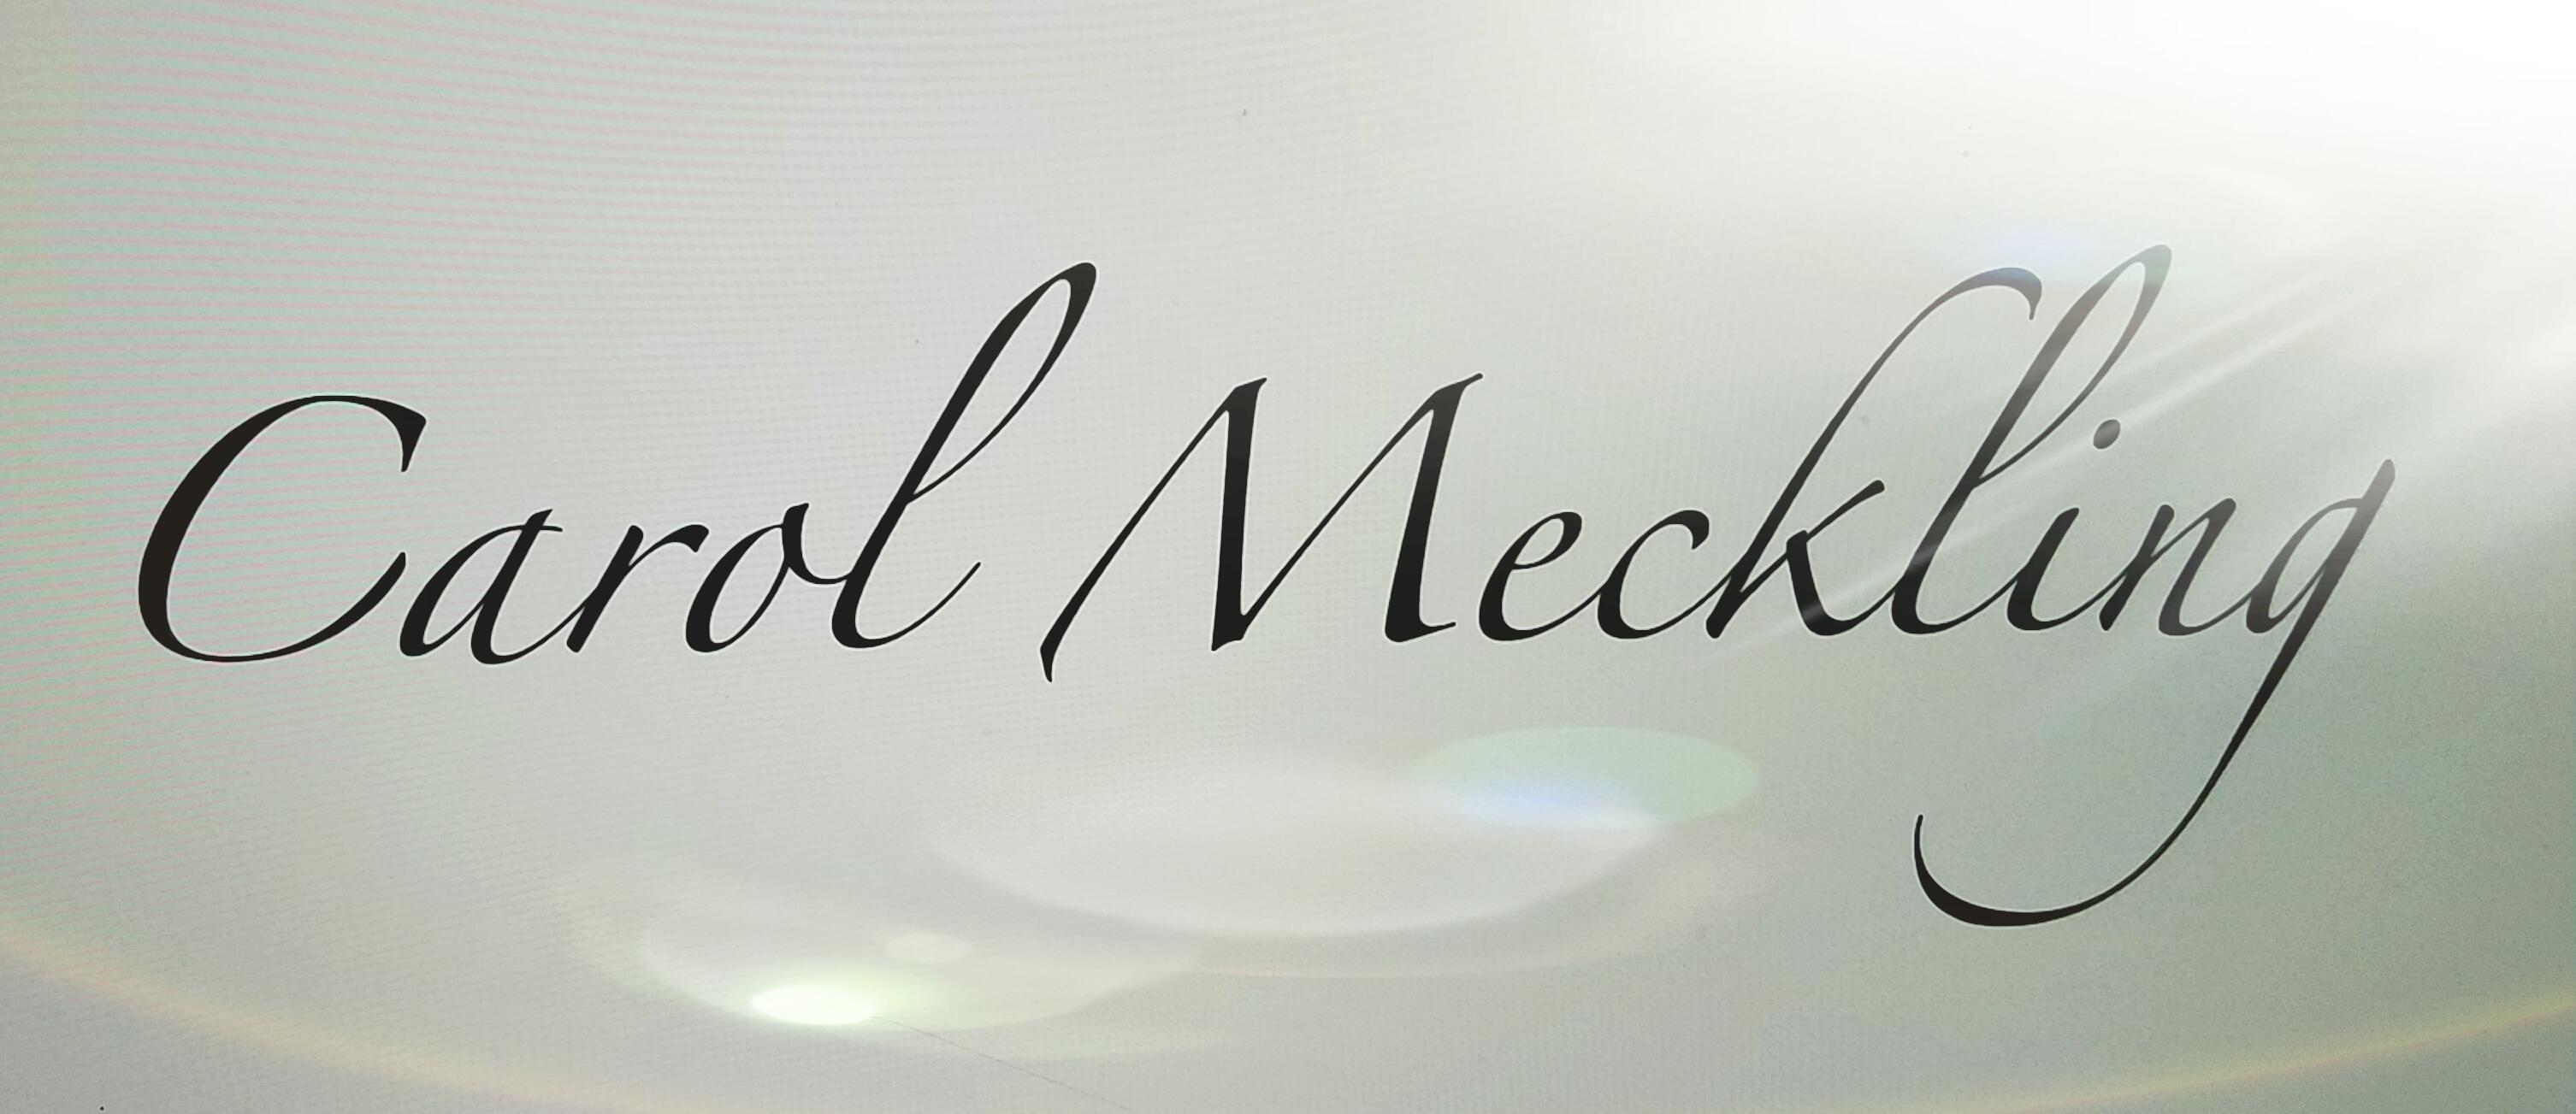 Carol Meckling's Signature